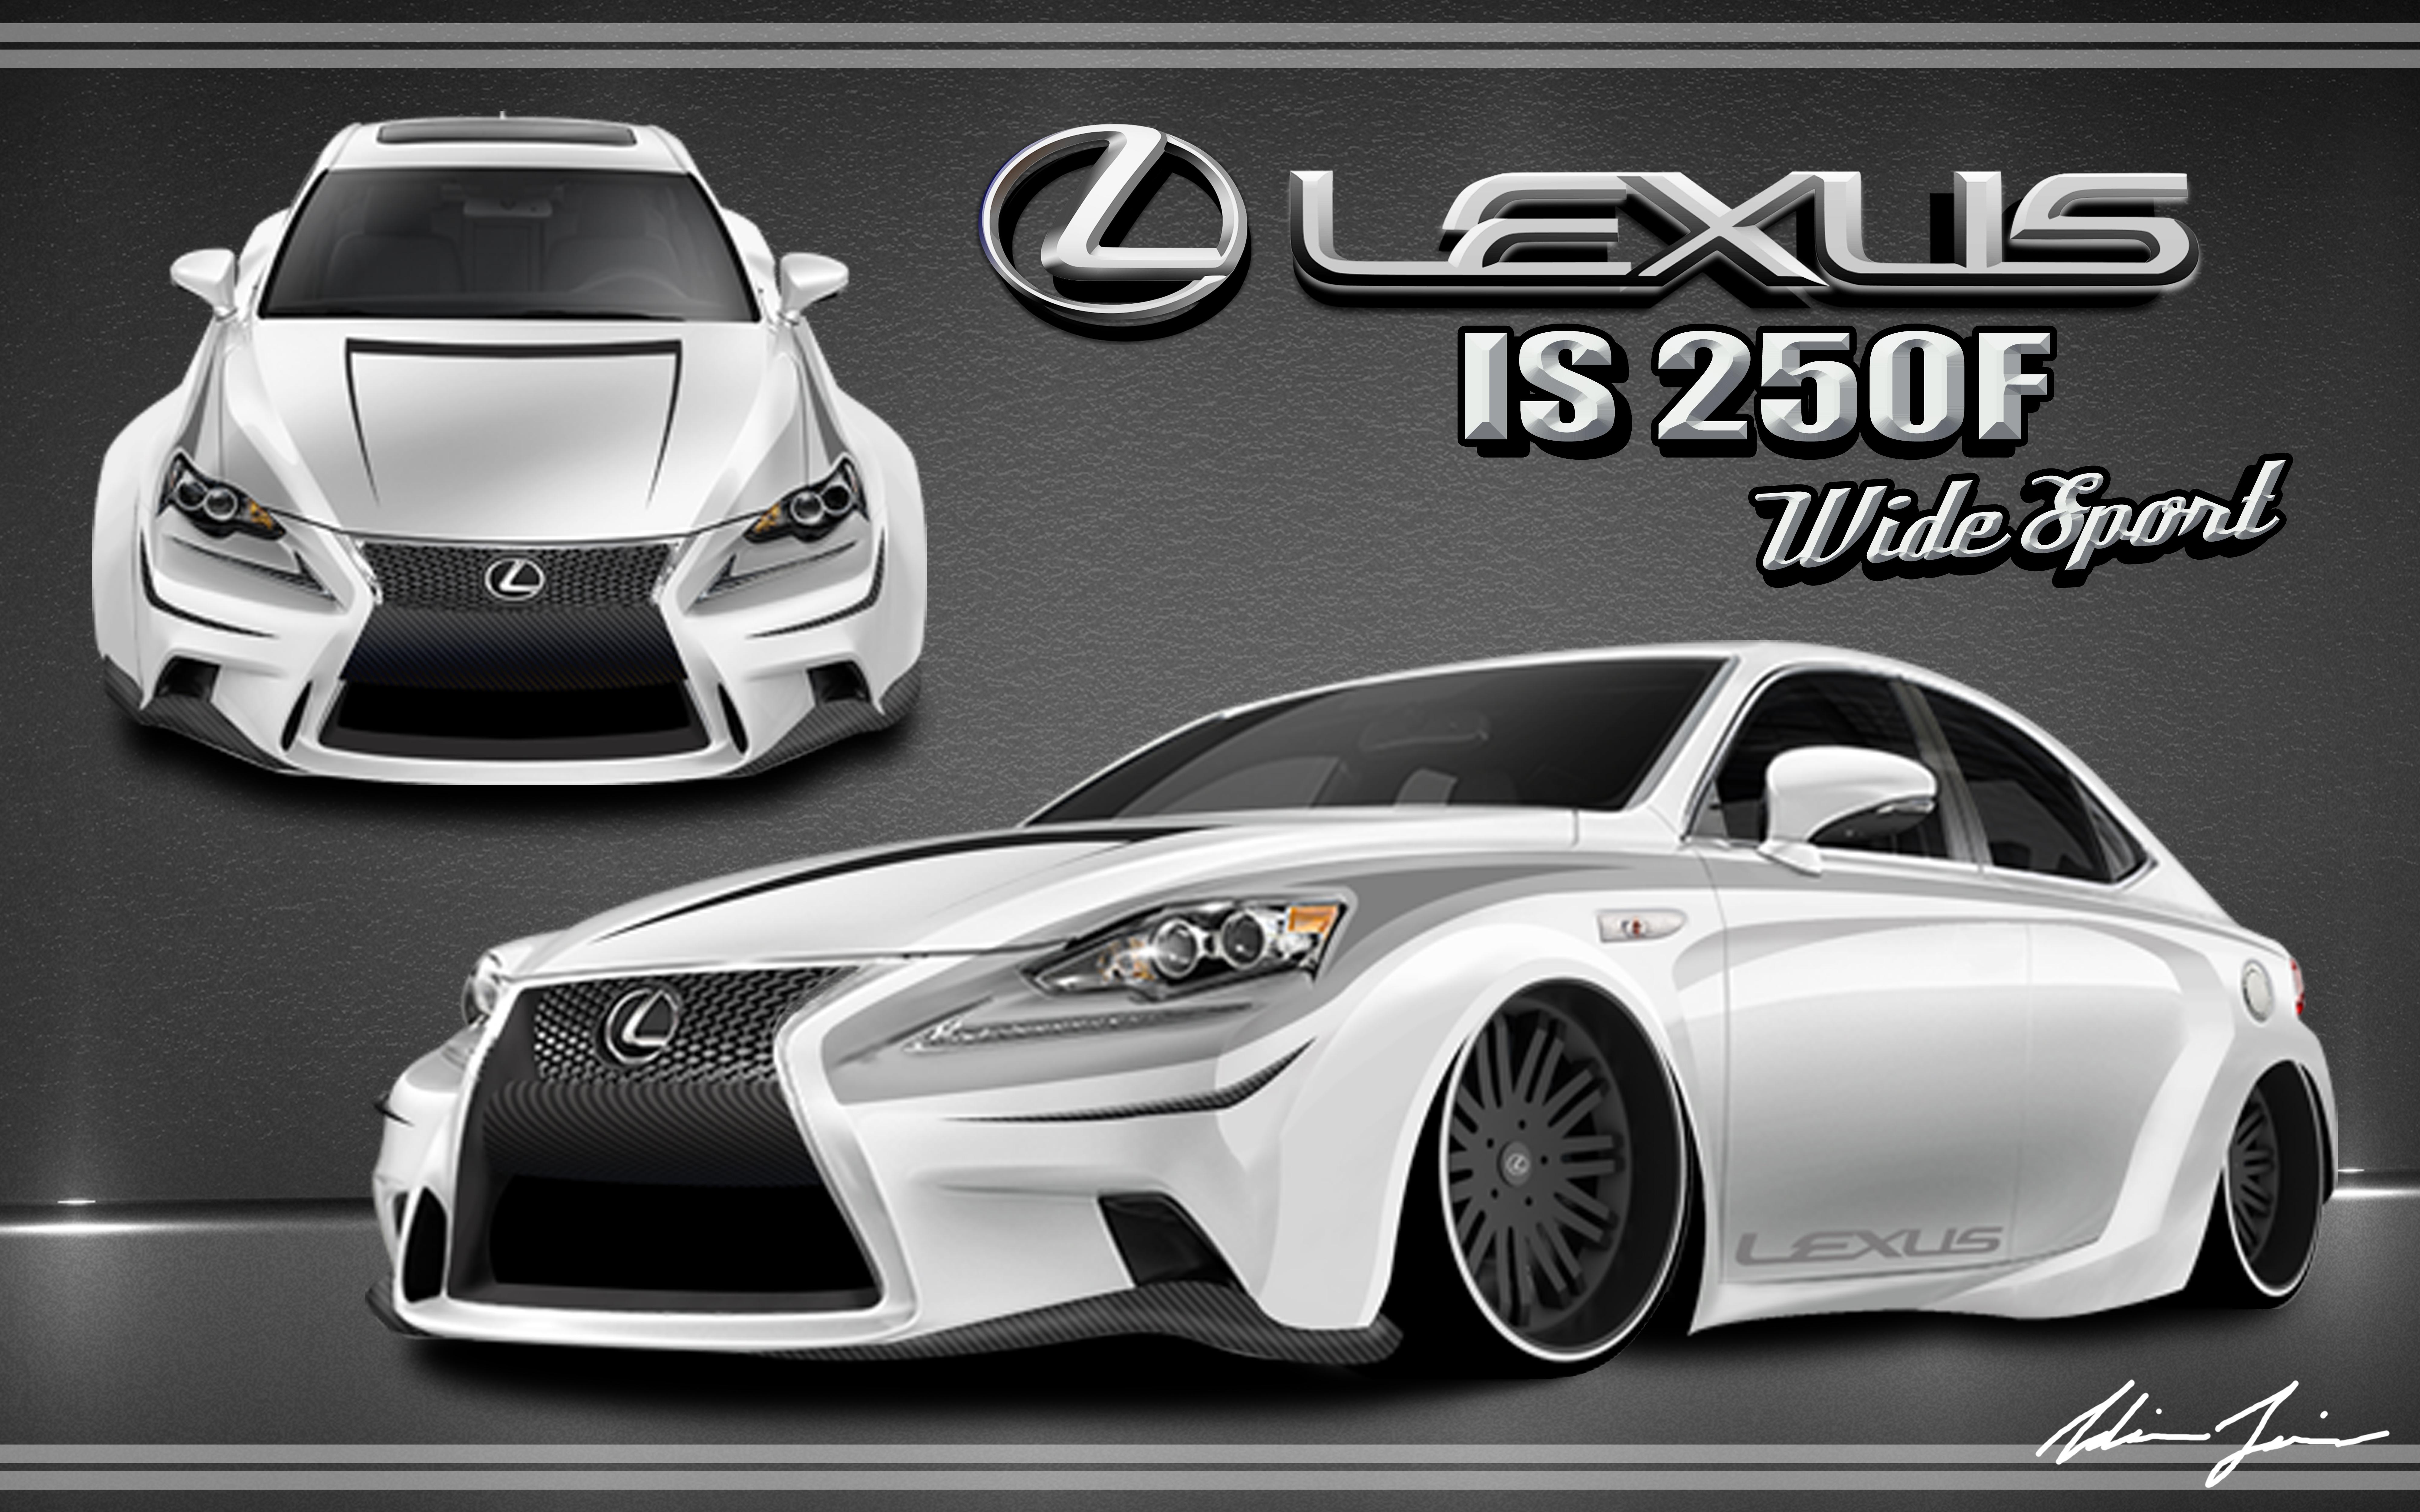 2013 lexus is 250f wide sport by swift money on deviantart. Black Bedroom Furniture Sets. Home Design Ideas